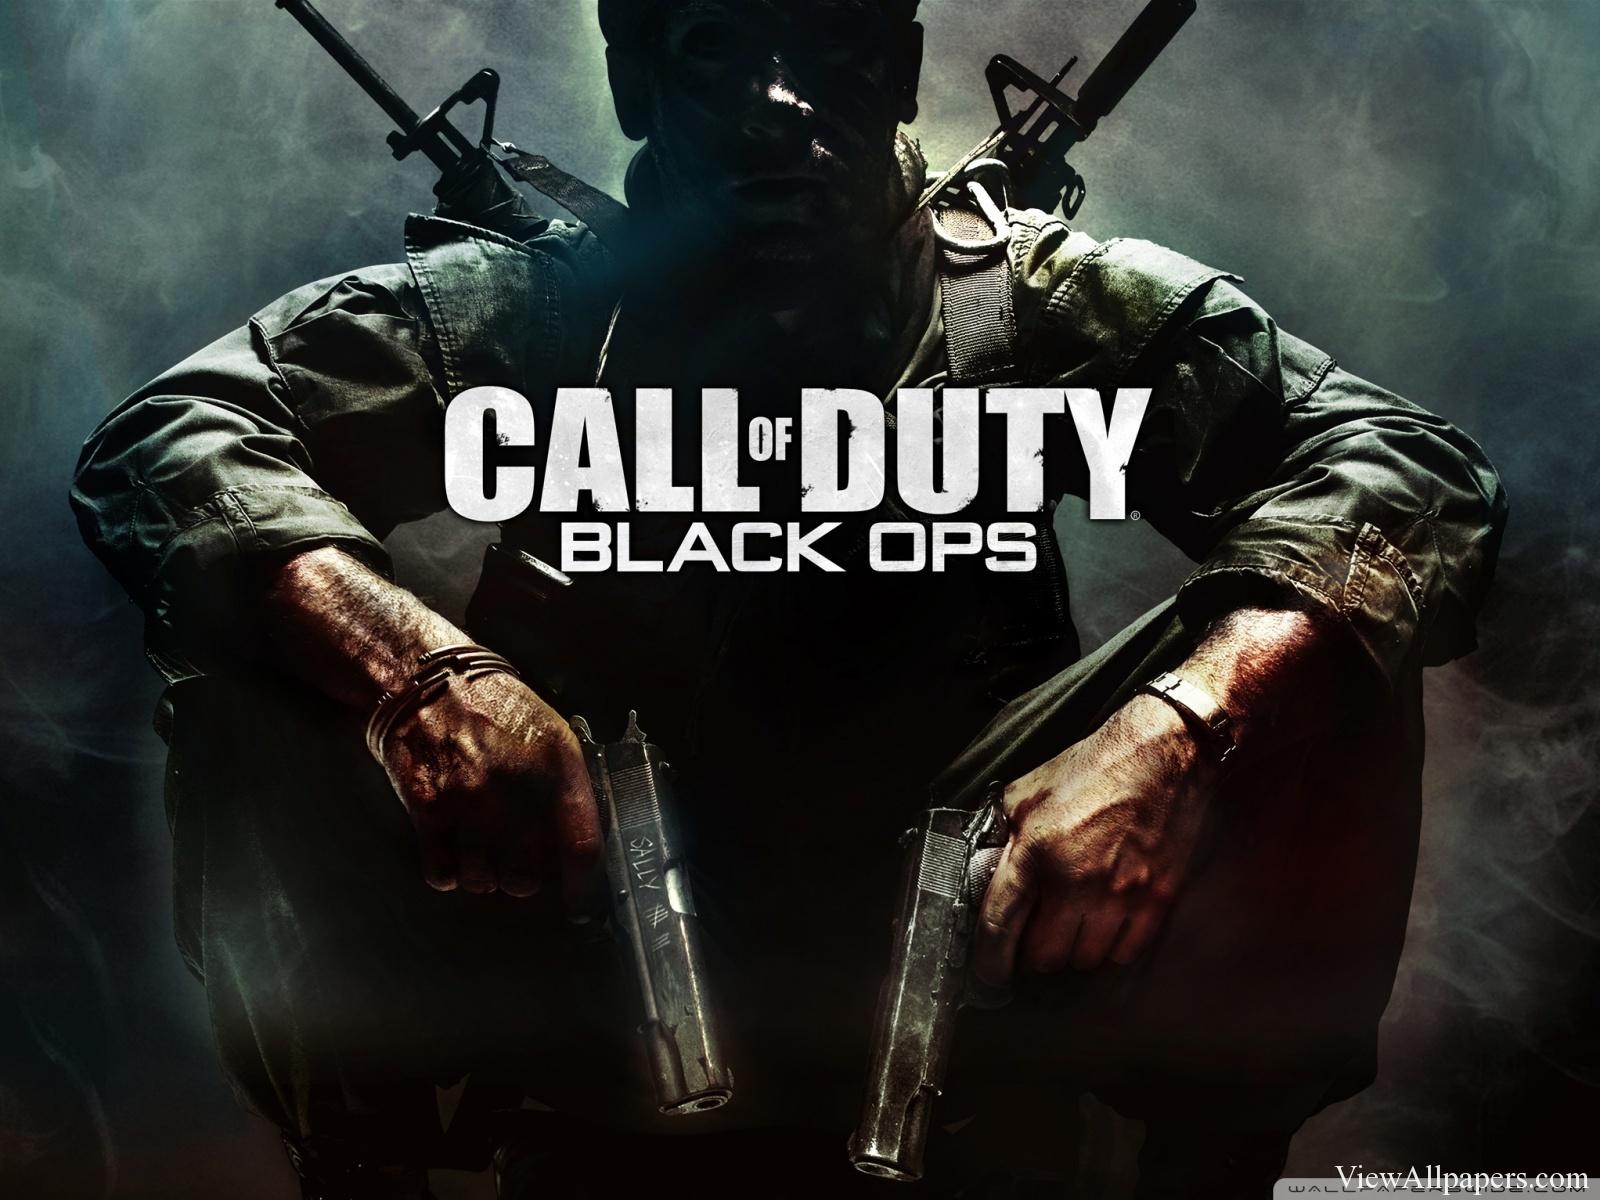 Black Ops 3 Images High Resolution Wallpaper download Black Ops 1600x1200